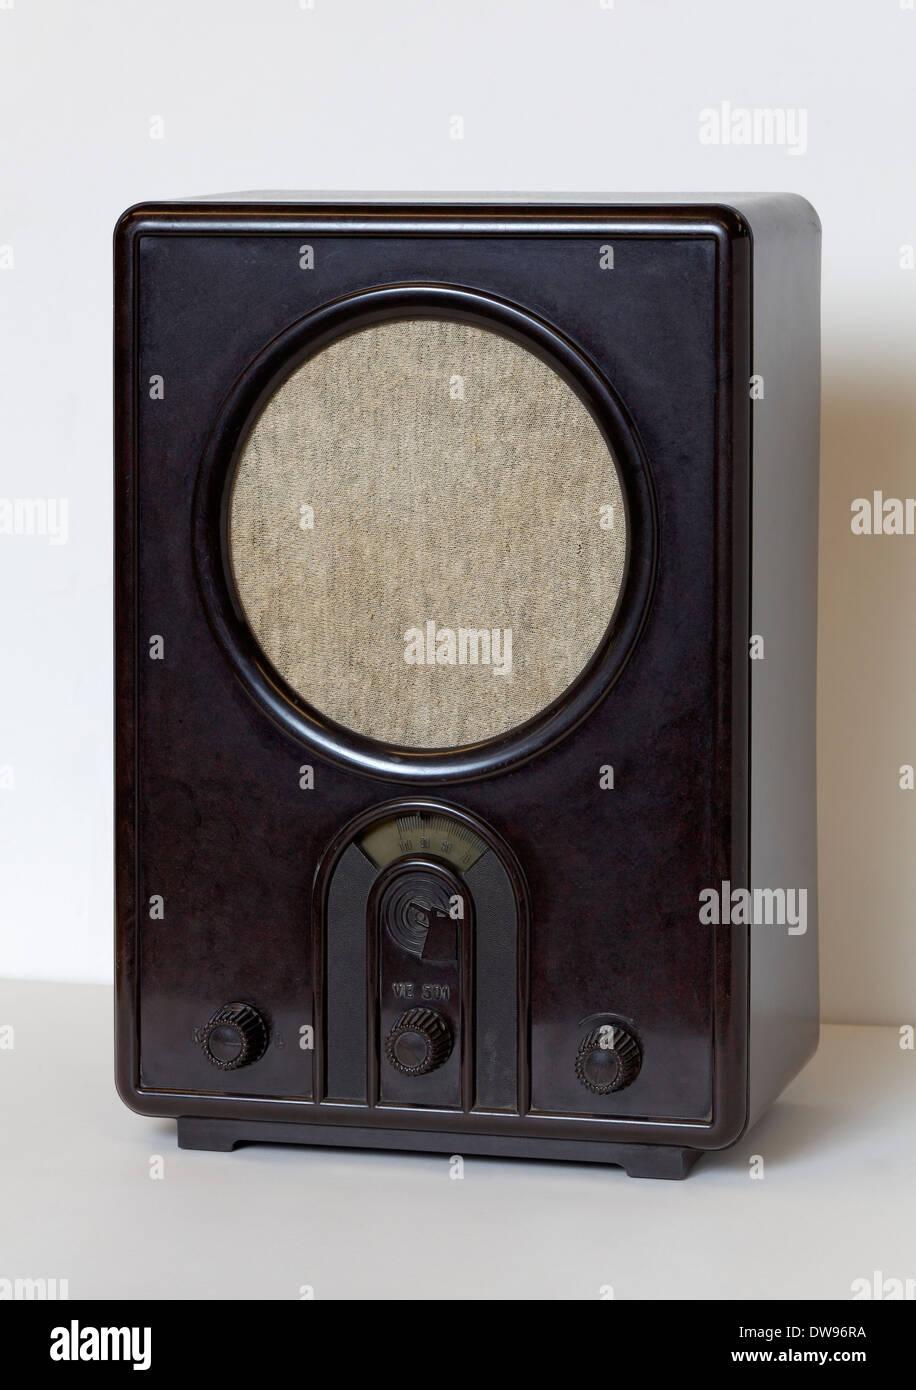 Volksempfänger VE 301 W, radio receiver from the Nazi era, built in 1933, Radio Museum Duisburg, North Rhine-Westphalia Stock Photo